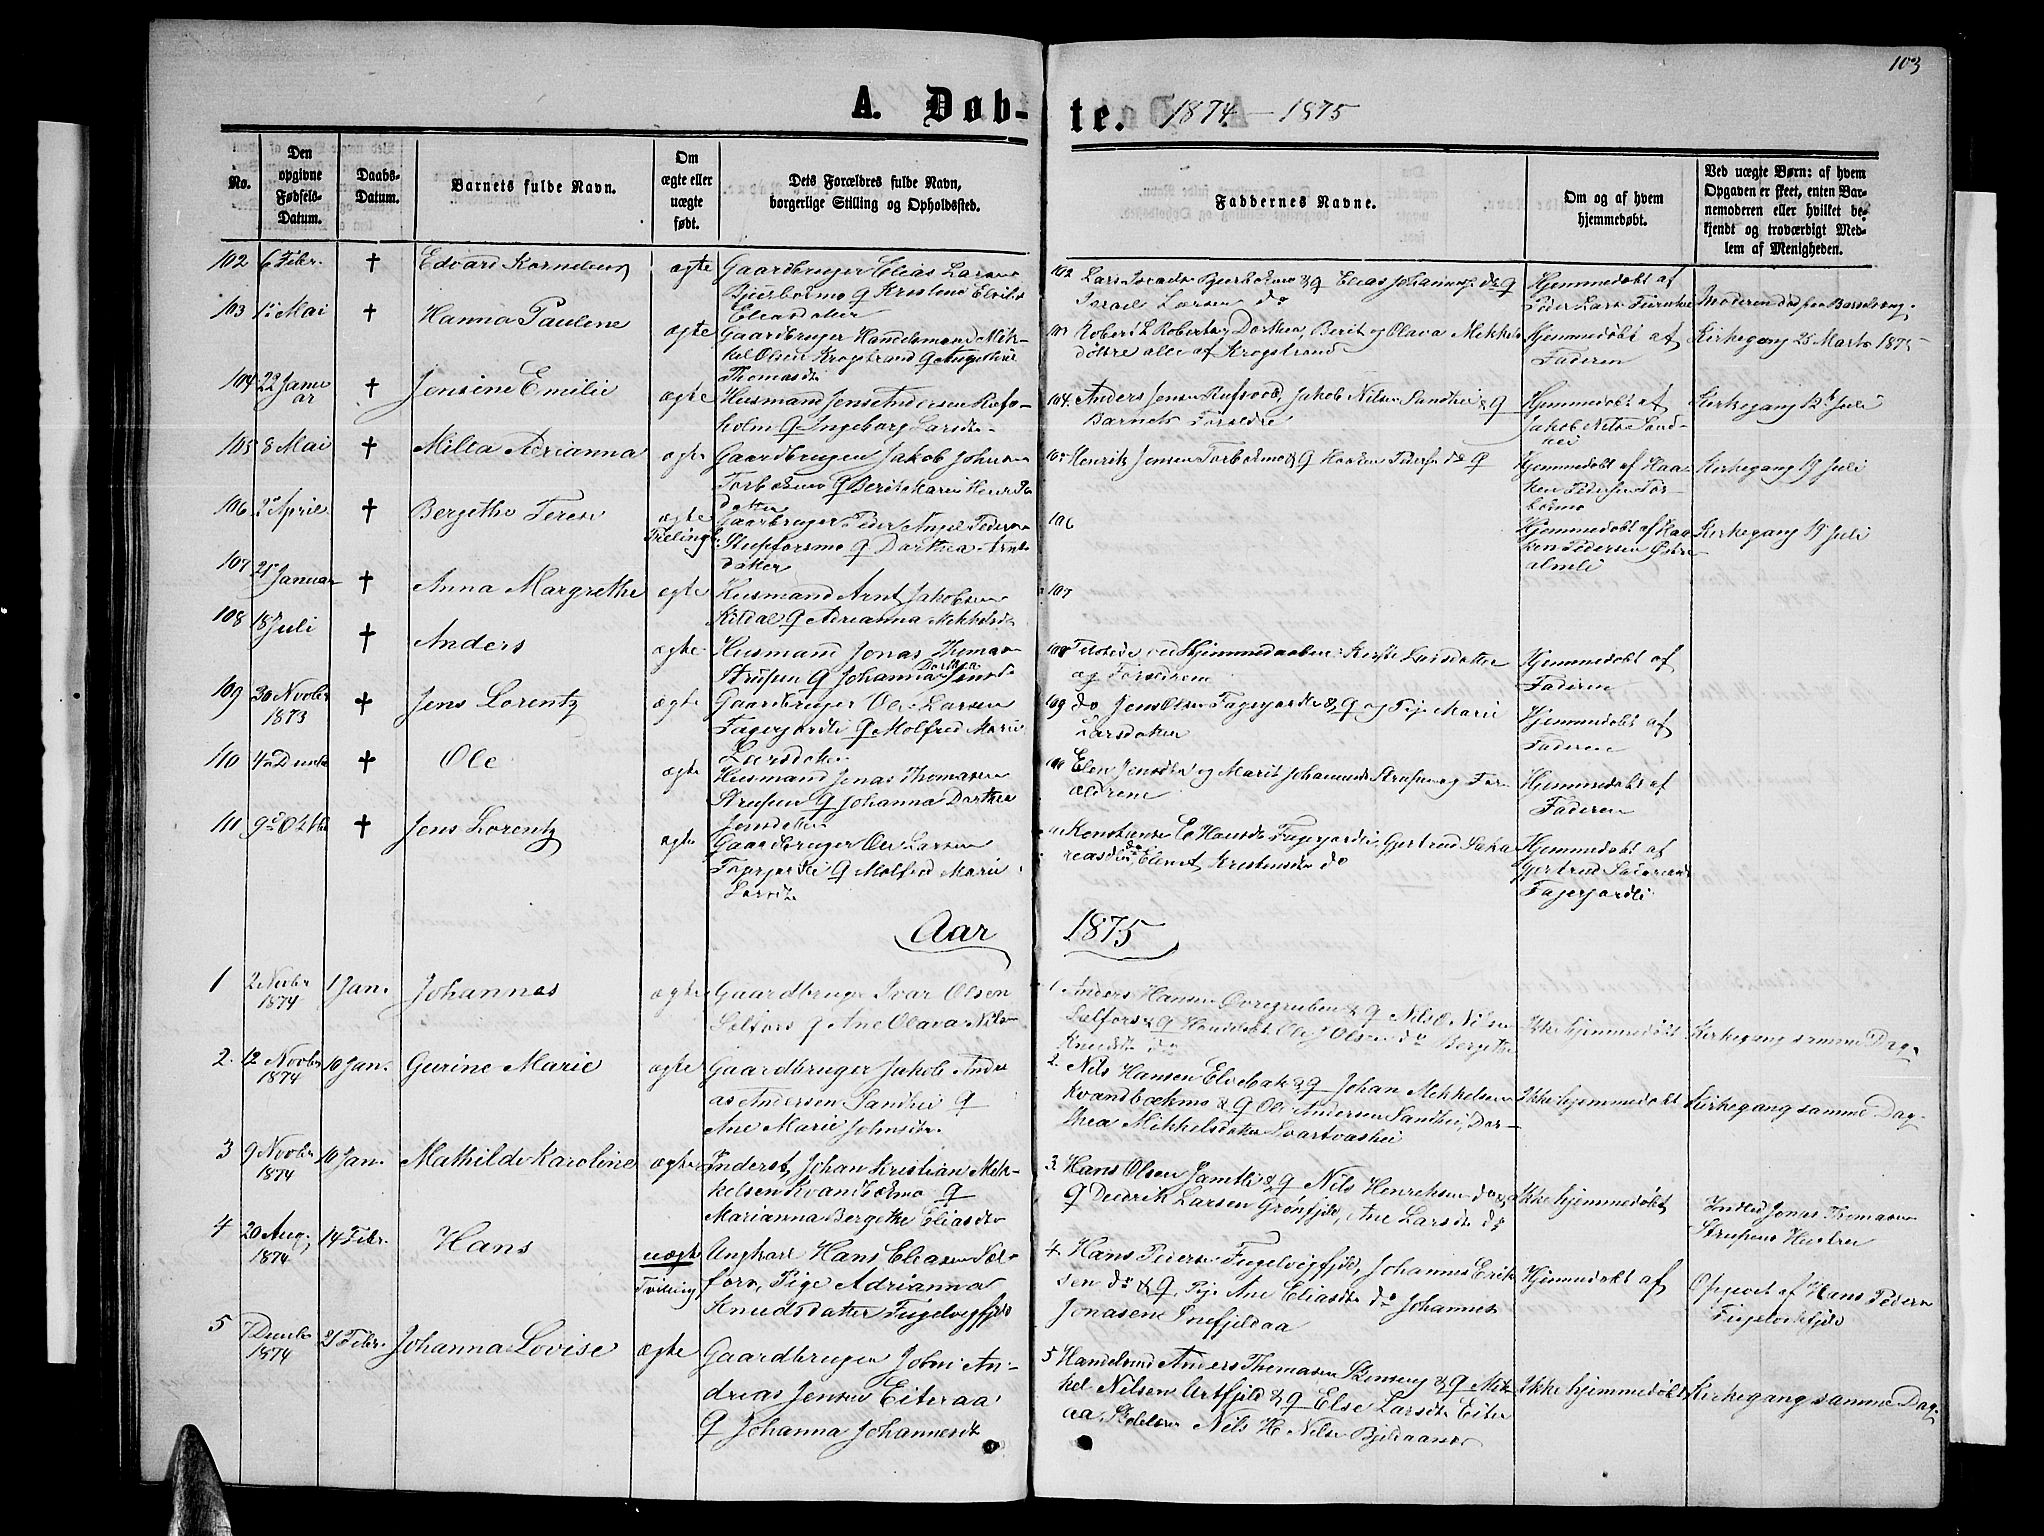 SAT, Ministerialprotokoller, klokkerbøker og fødselsregistre - Nordland, 827/L0415: Klokkerbok nr. 827C04, 1864-1886, s. 103